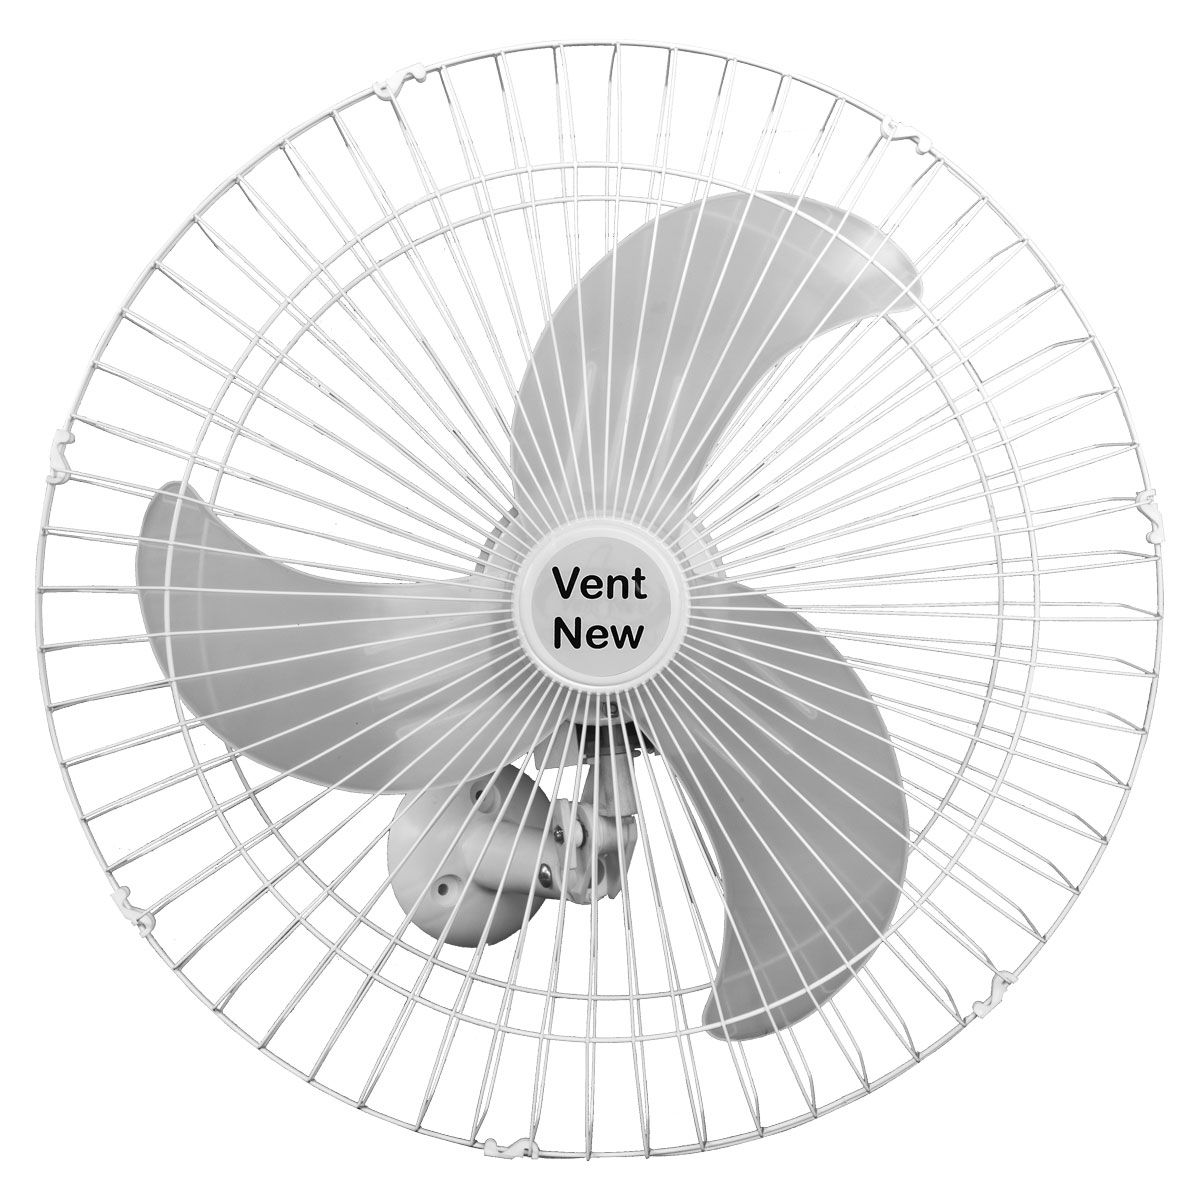 Kit 3 Ventiladores Parede Bivolt Branco Oscilante 60 Cm